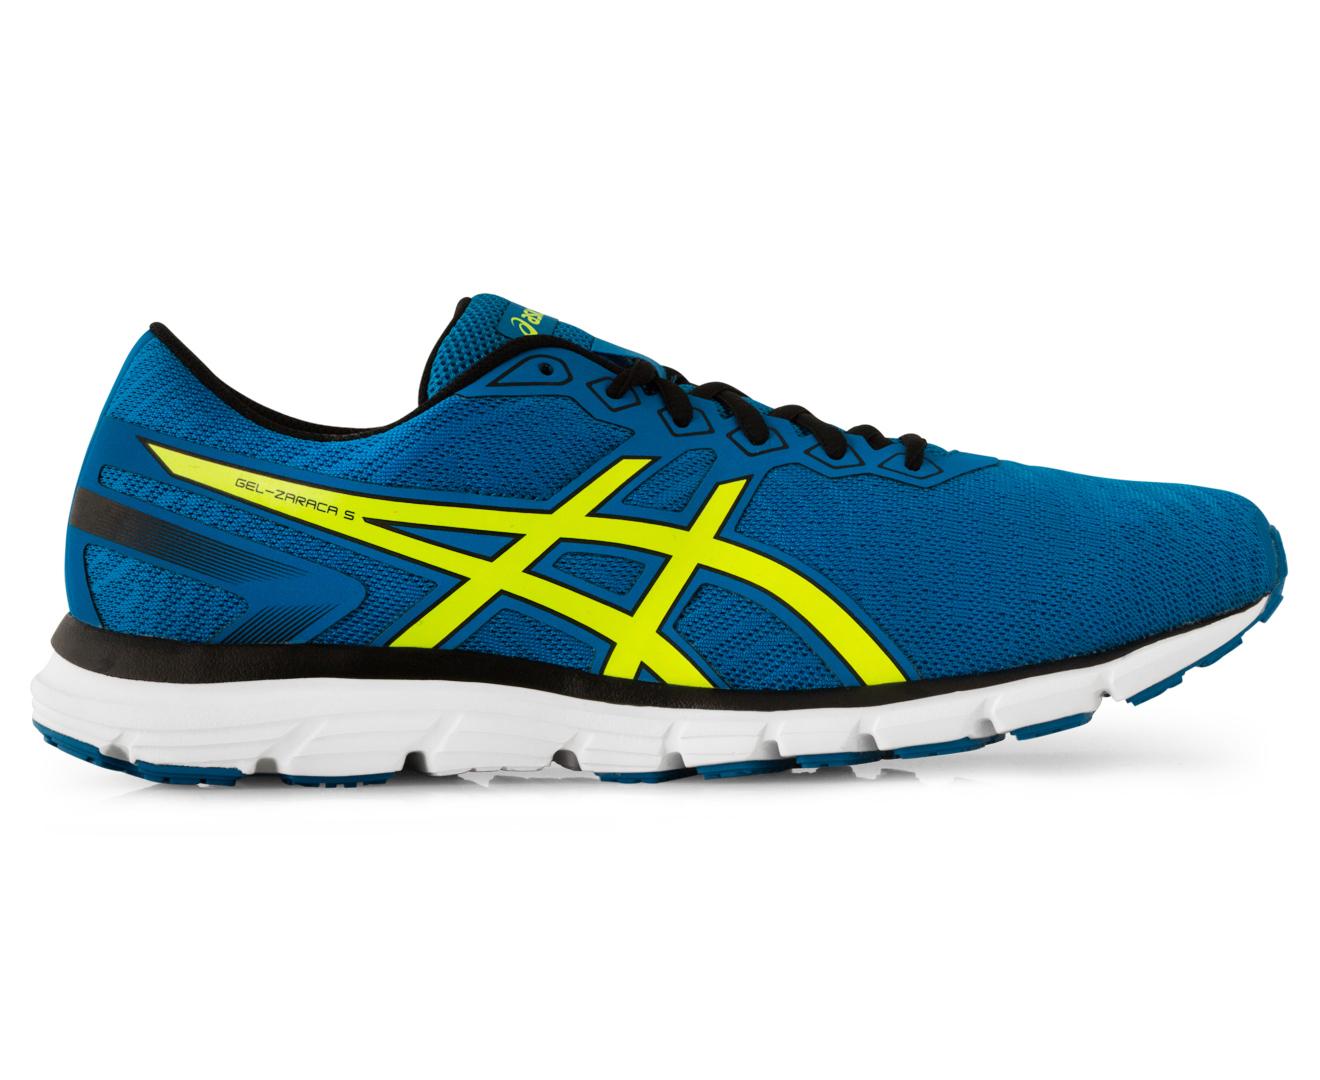 competitive price 7e75c e4fde ASICS Men's GEL-Zaraca 5 Shoe - Electric Blue/Safety Yellow/Black